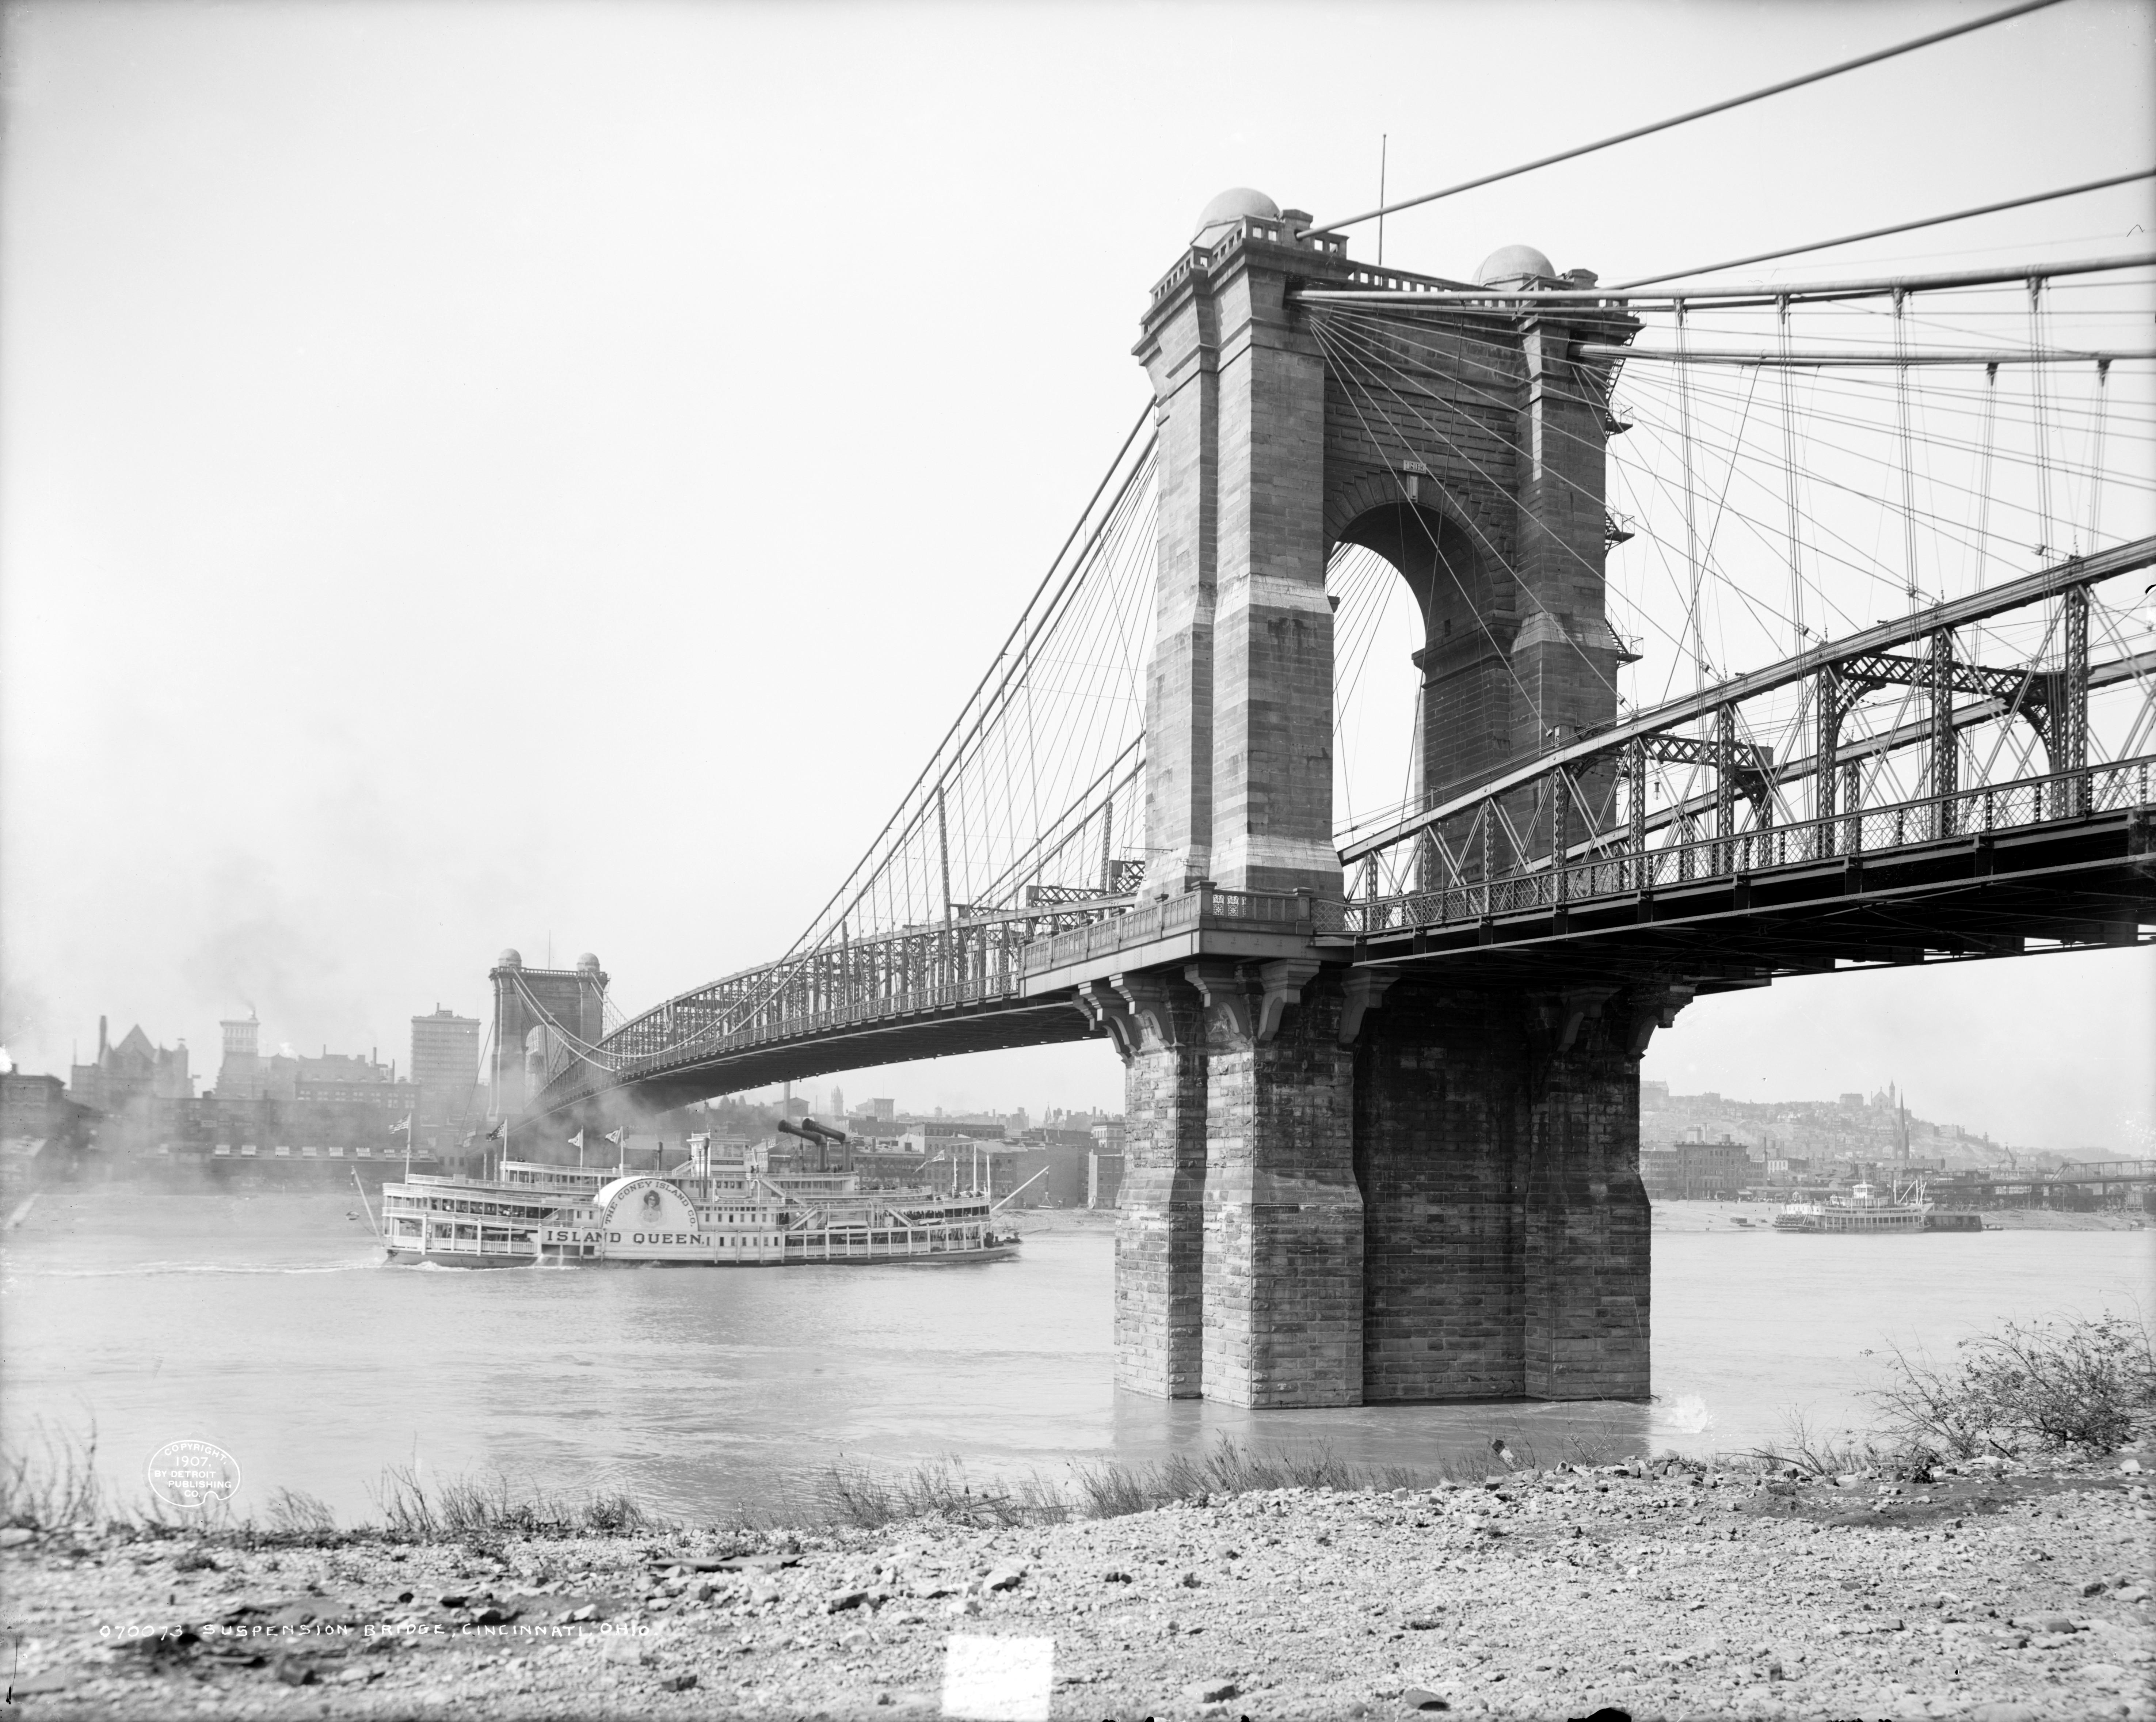 The John A. Roebling Suspension Bridge spans the Ohio River.